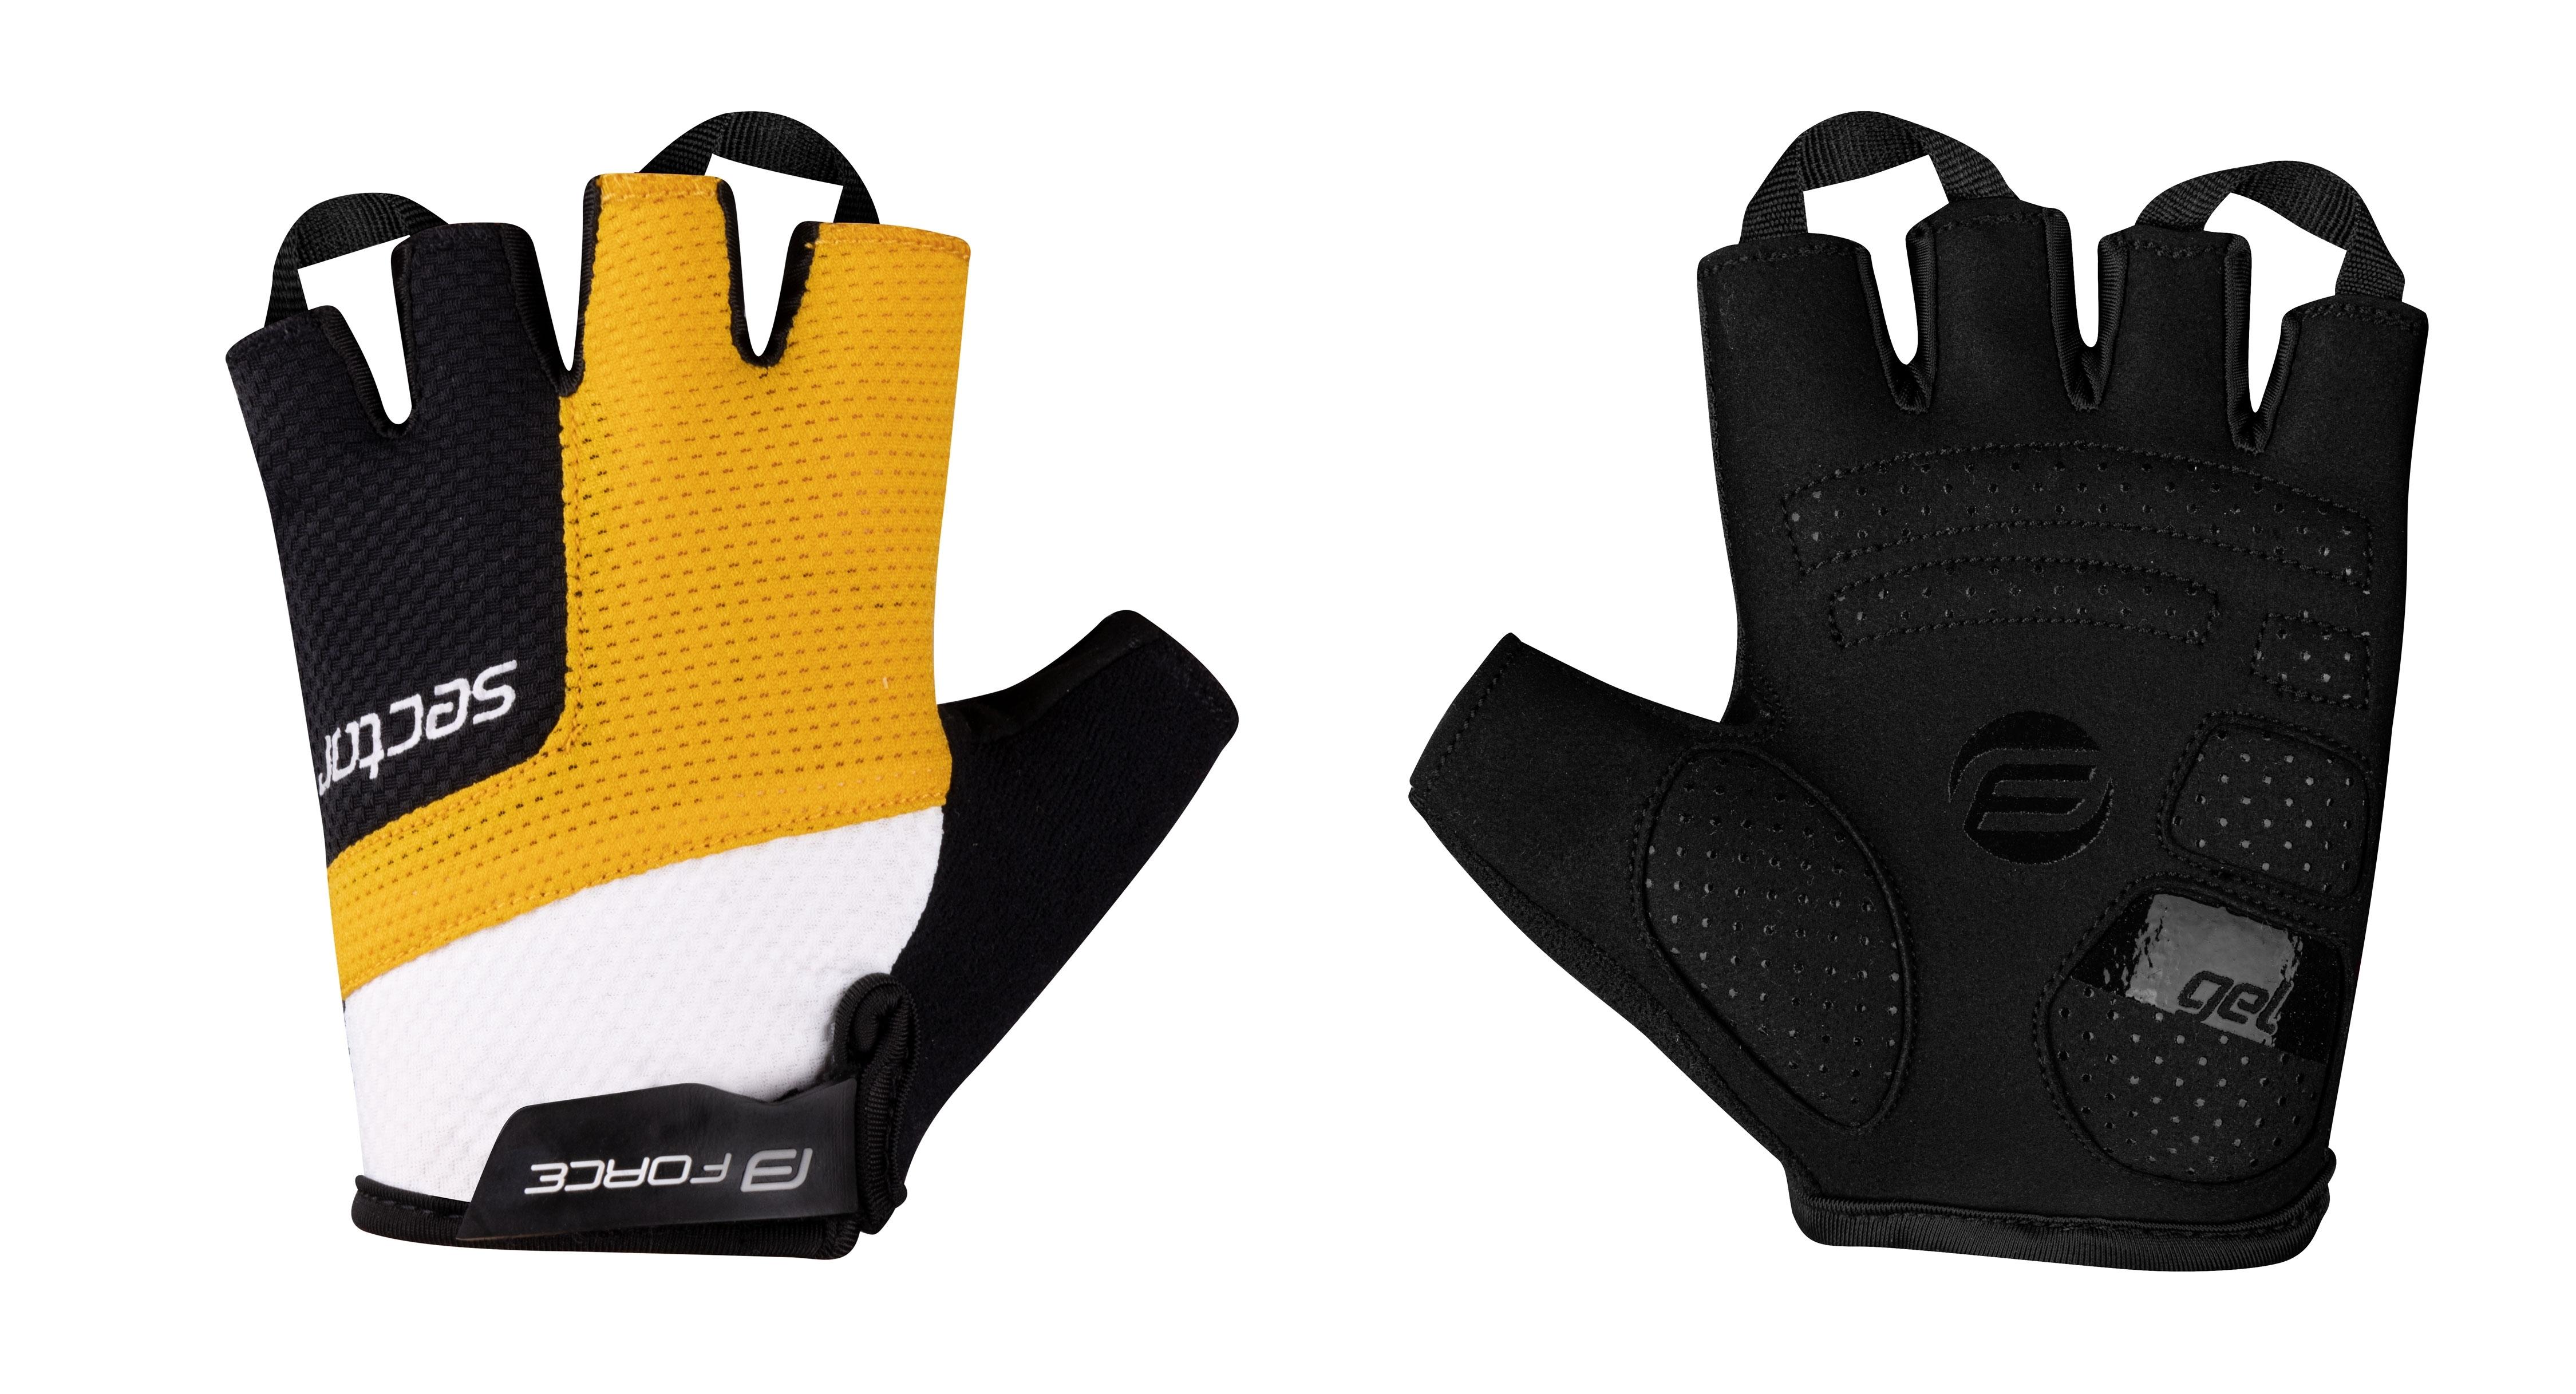 rukavice FORCE SECTOR gel, černo-žluté XL